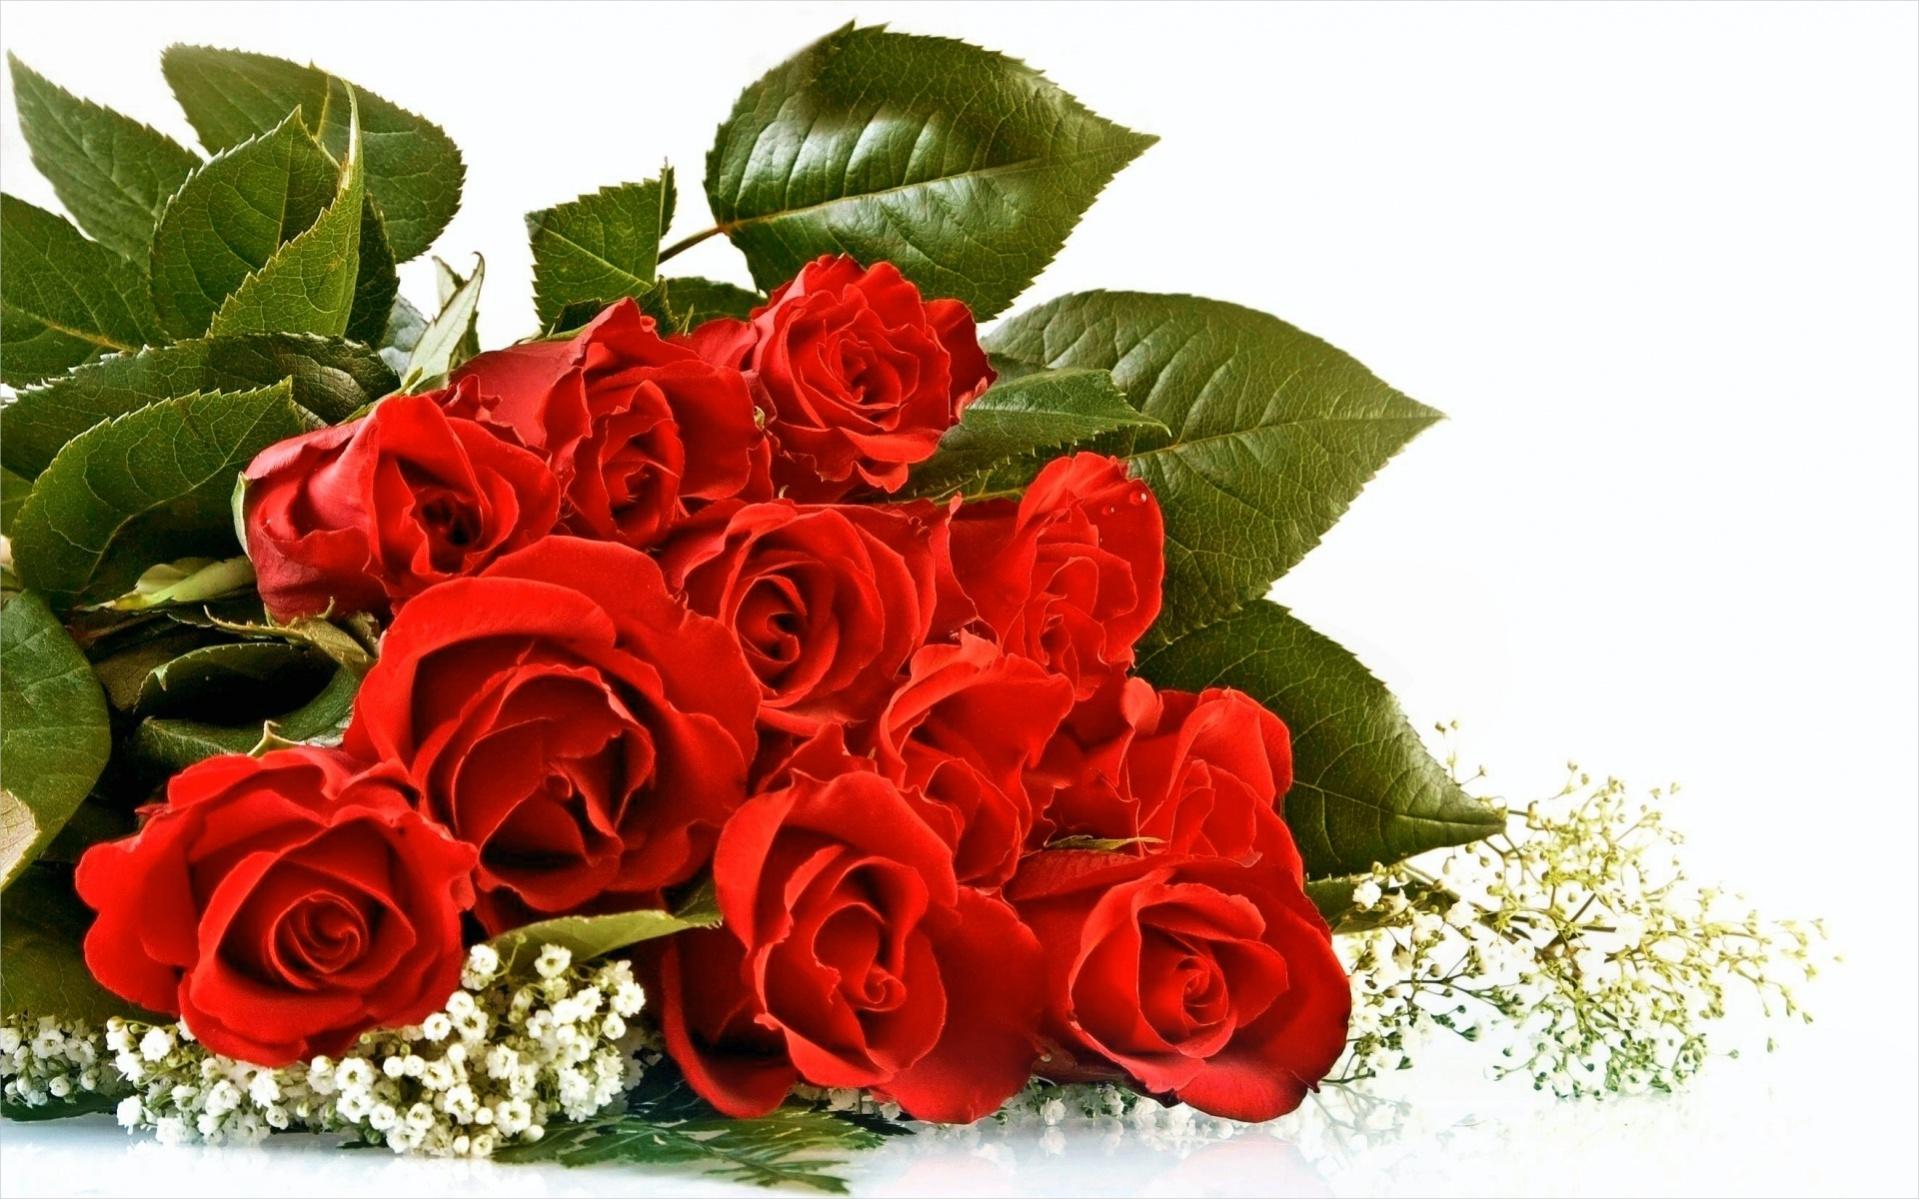 Free HD Rose Wallpaper